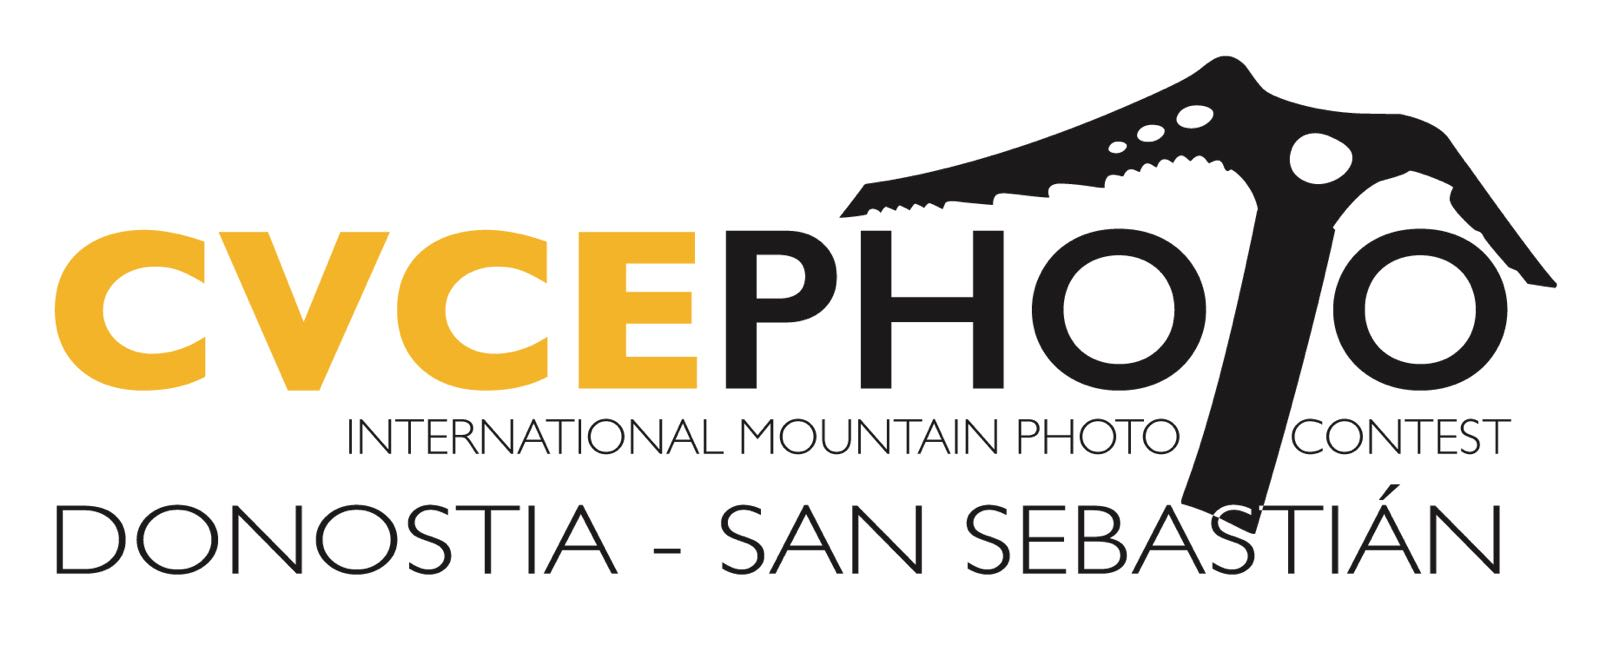 CVCEPHOTO 2019 – INTERNATIONAL PHOTOGRAPHY CONTEST OF MOUNTAIN ACTIVITY - logo